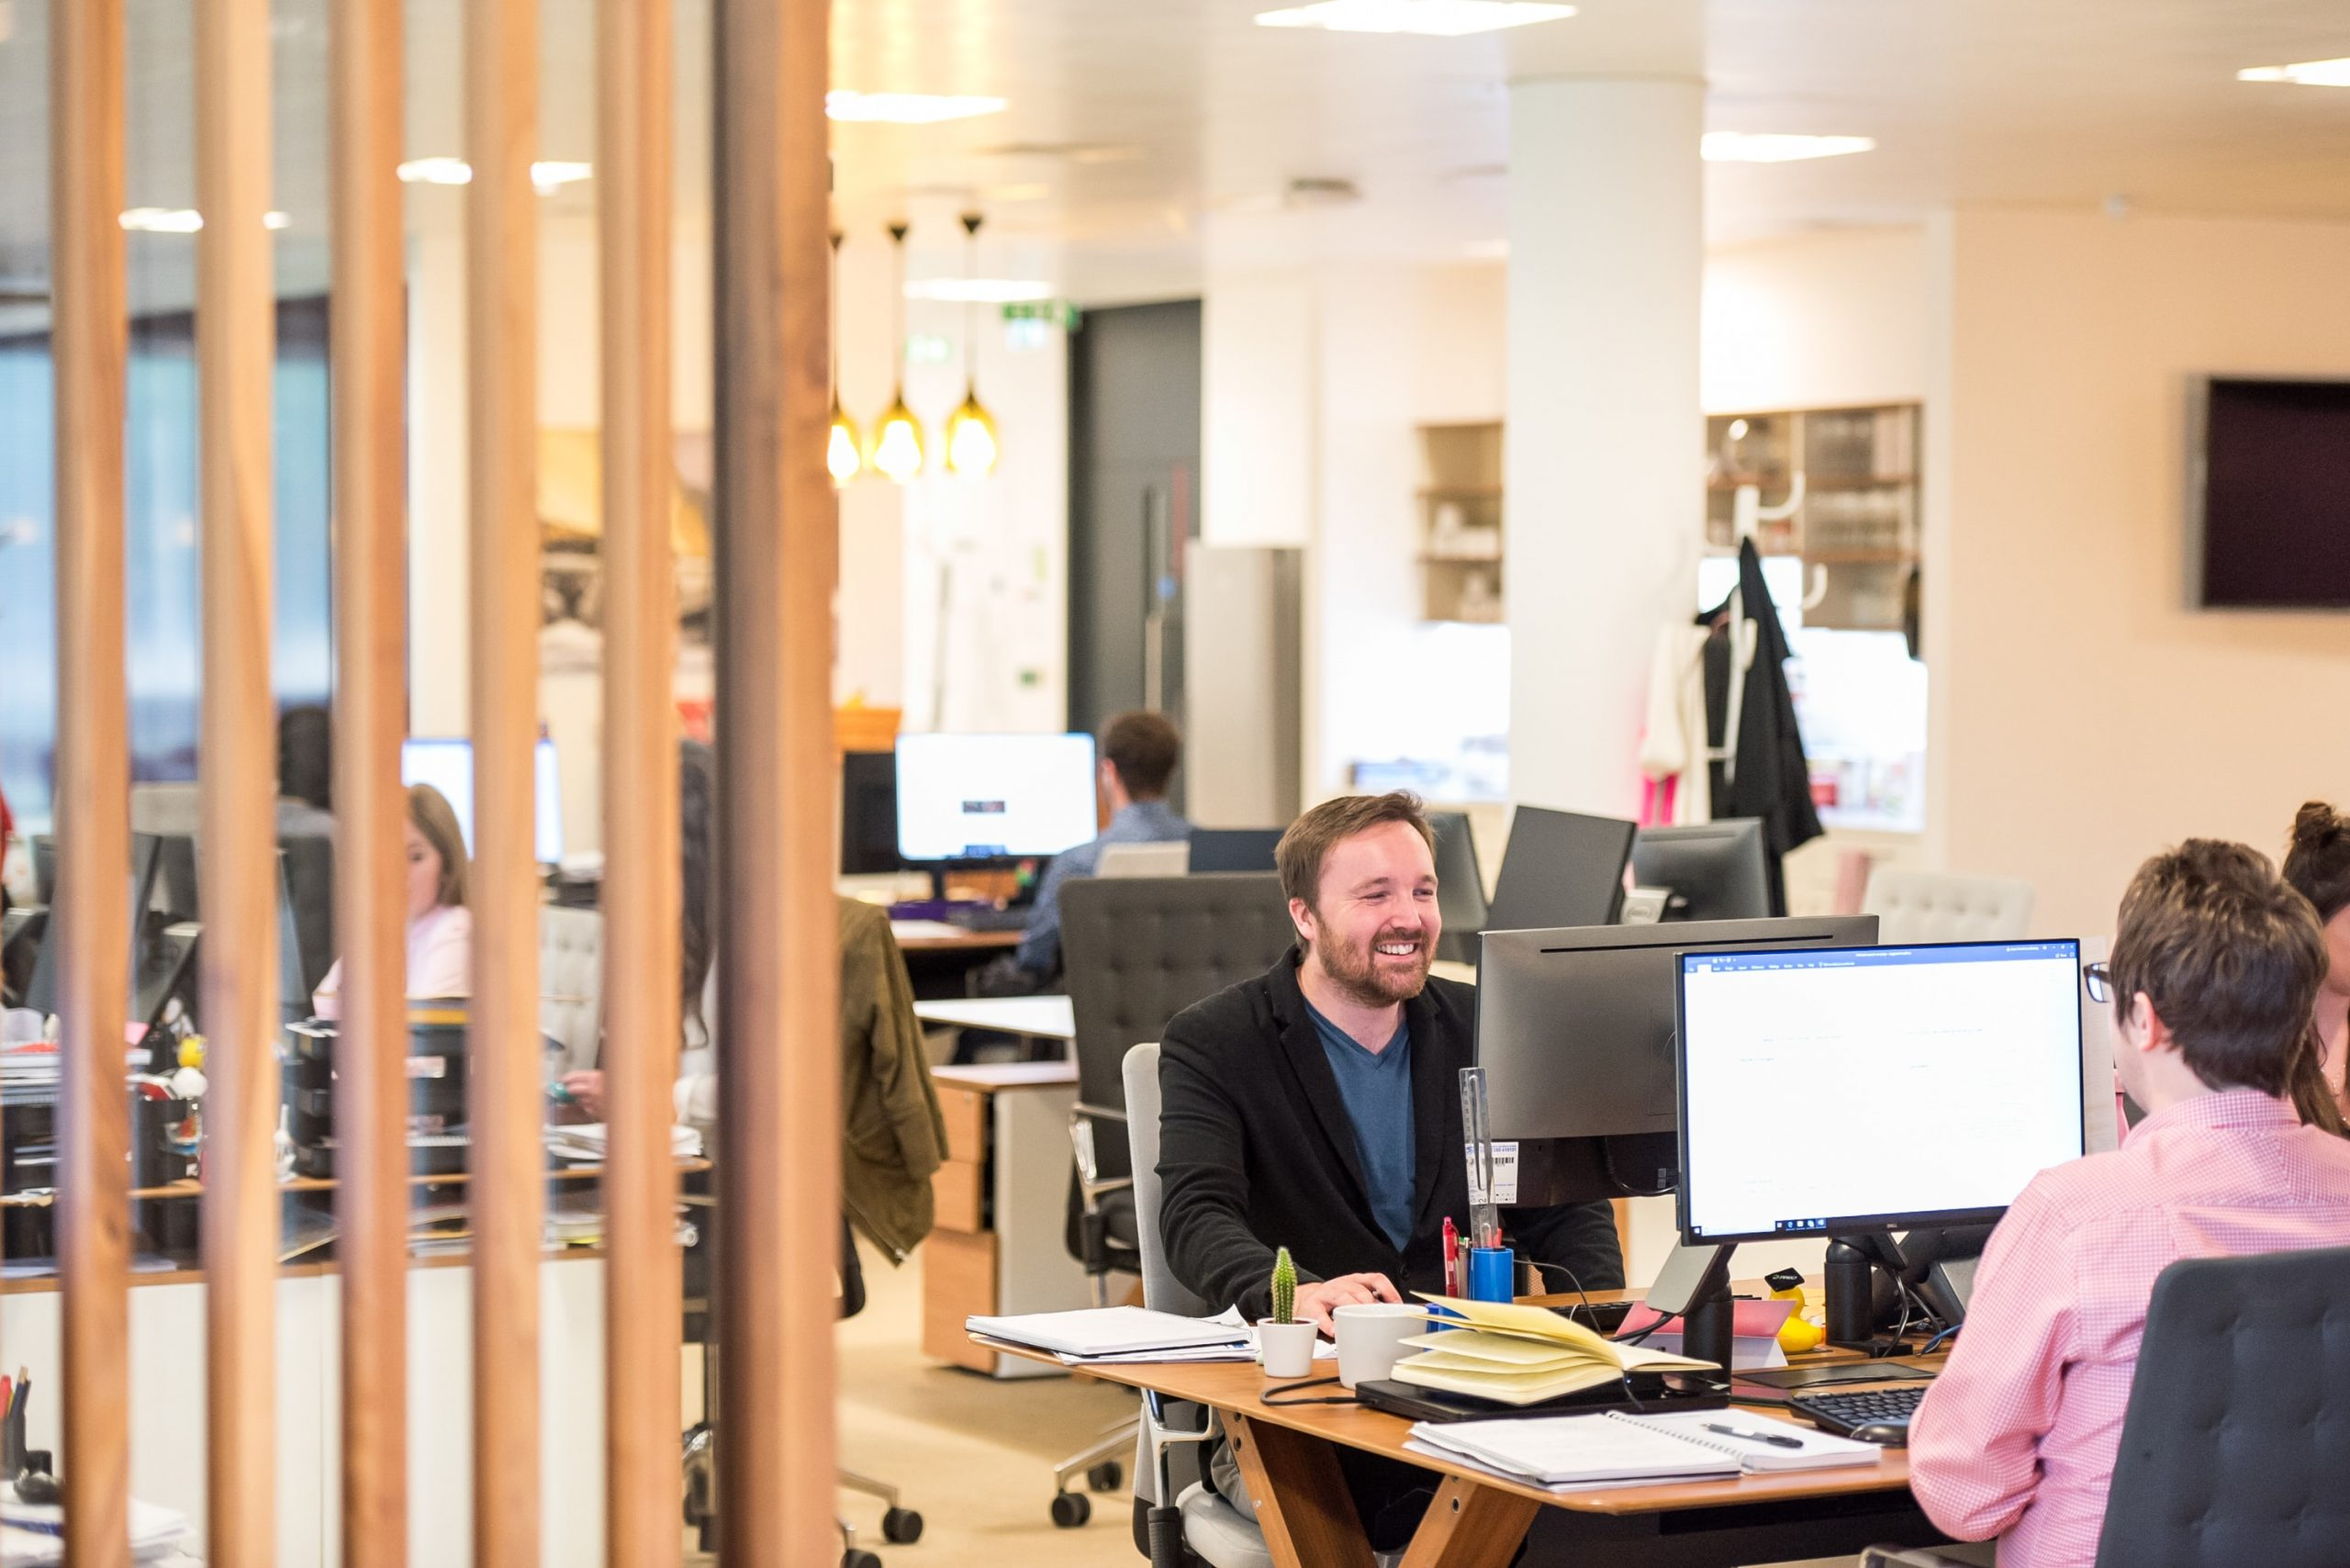 Hiring Tech Talent/ How to hire tech talent